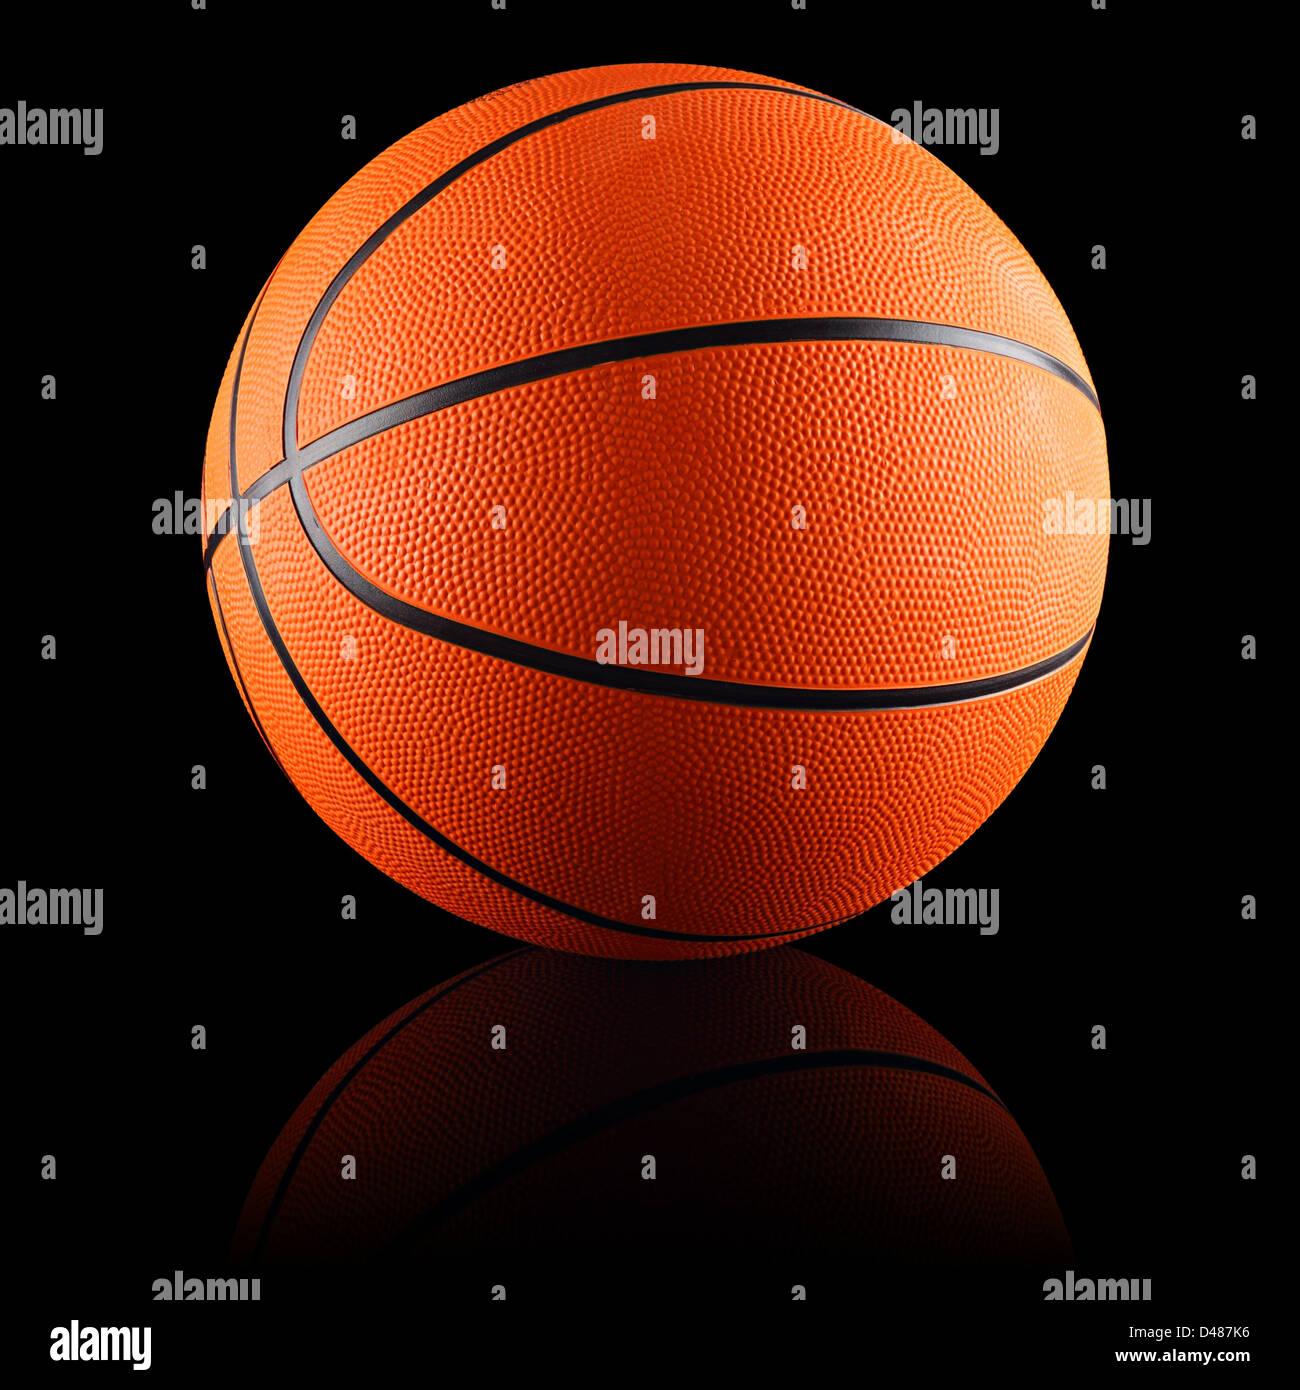 Un terrain de basket-ball orange en face de fond noir Photo Stock